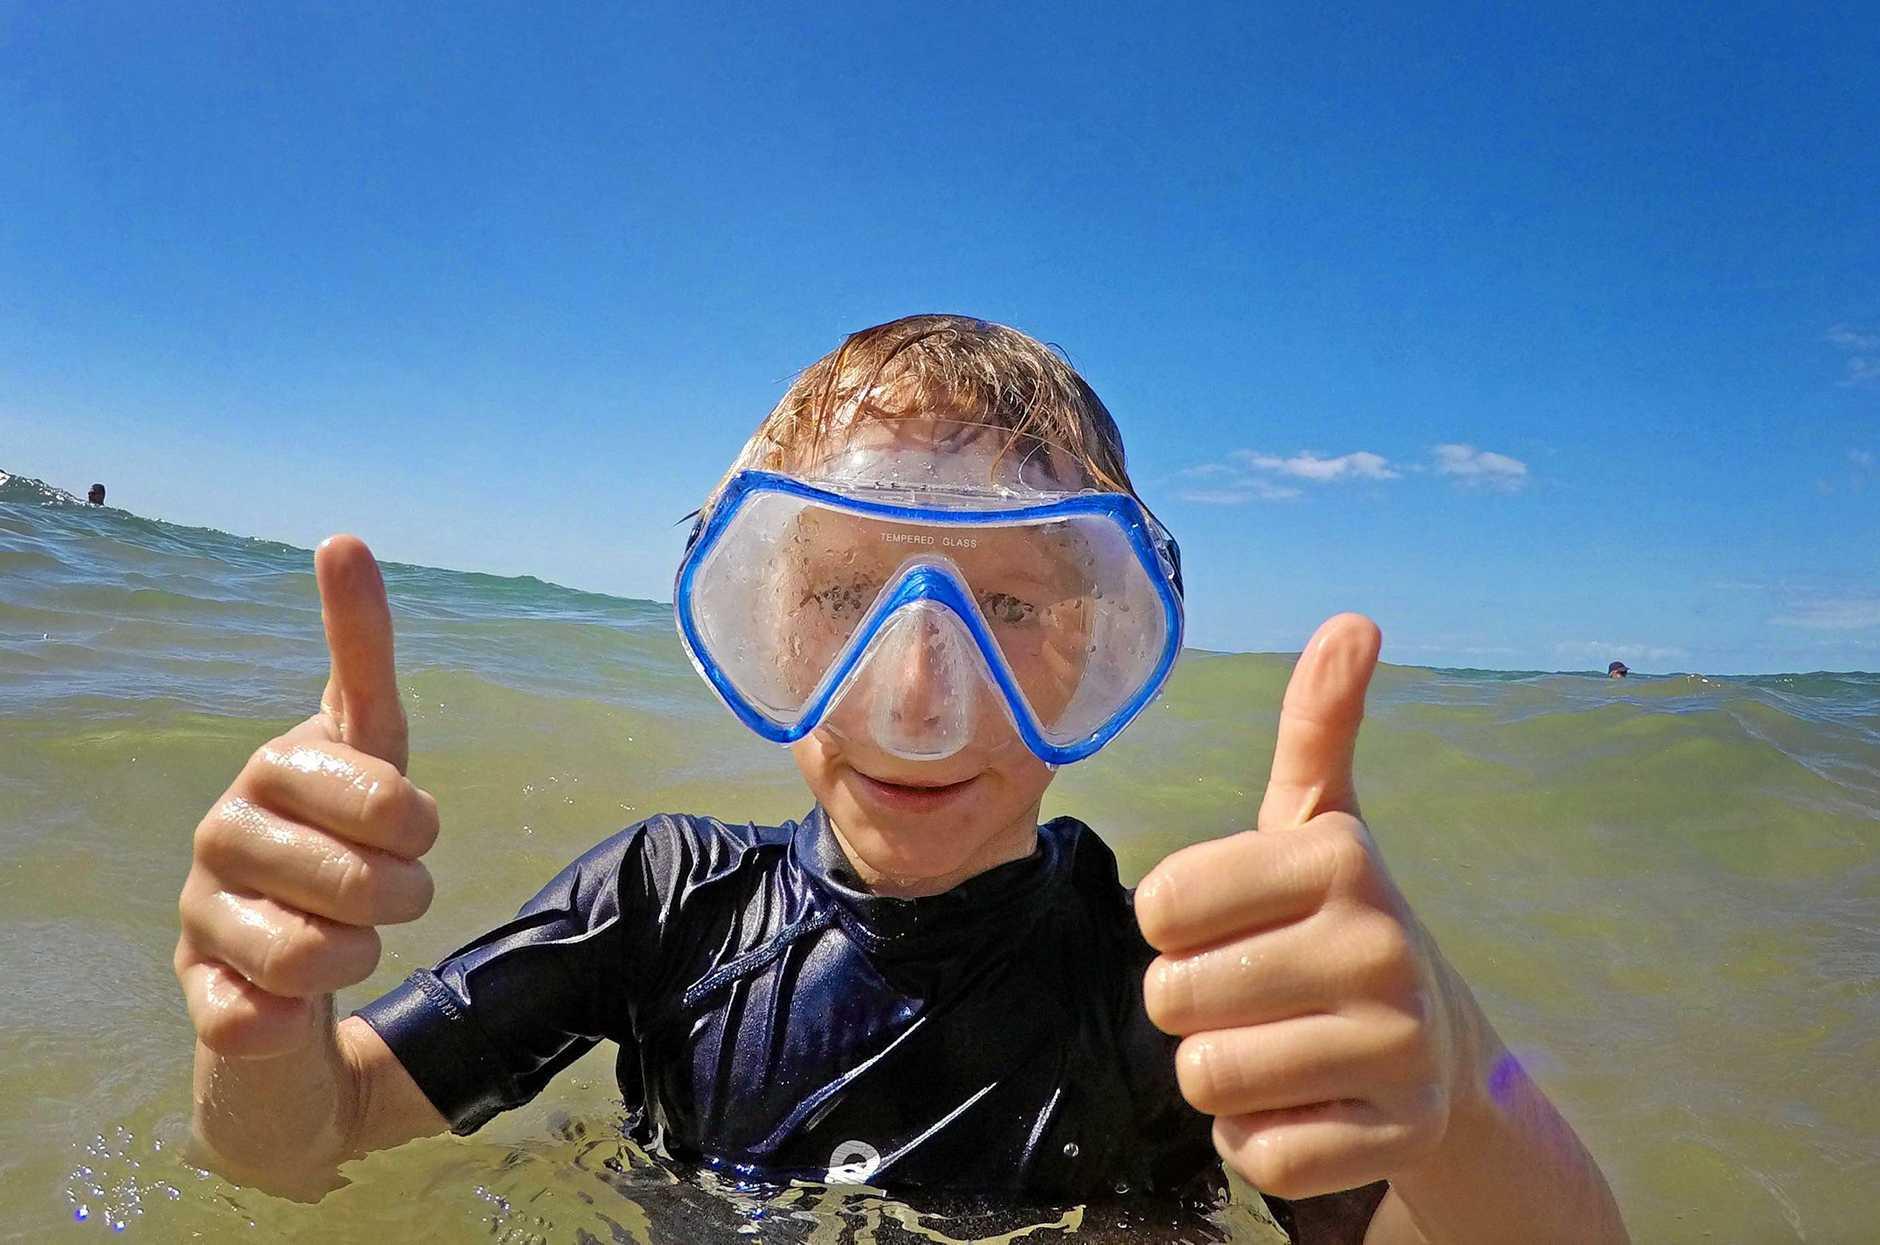 Temperatures set to soar - 10yo Elijah Haupstein cools off in the waters of Torquay Beach.